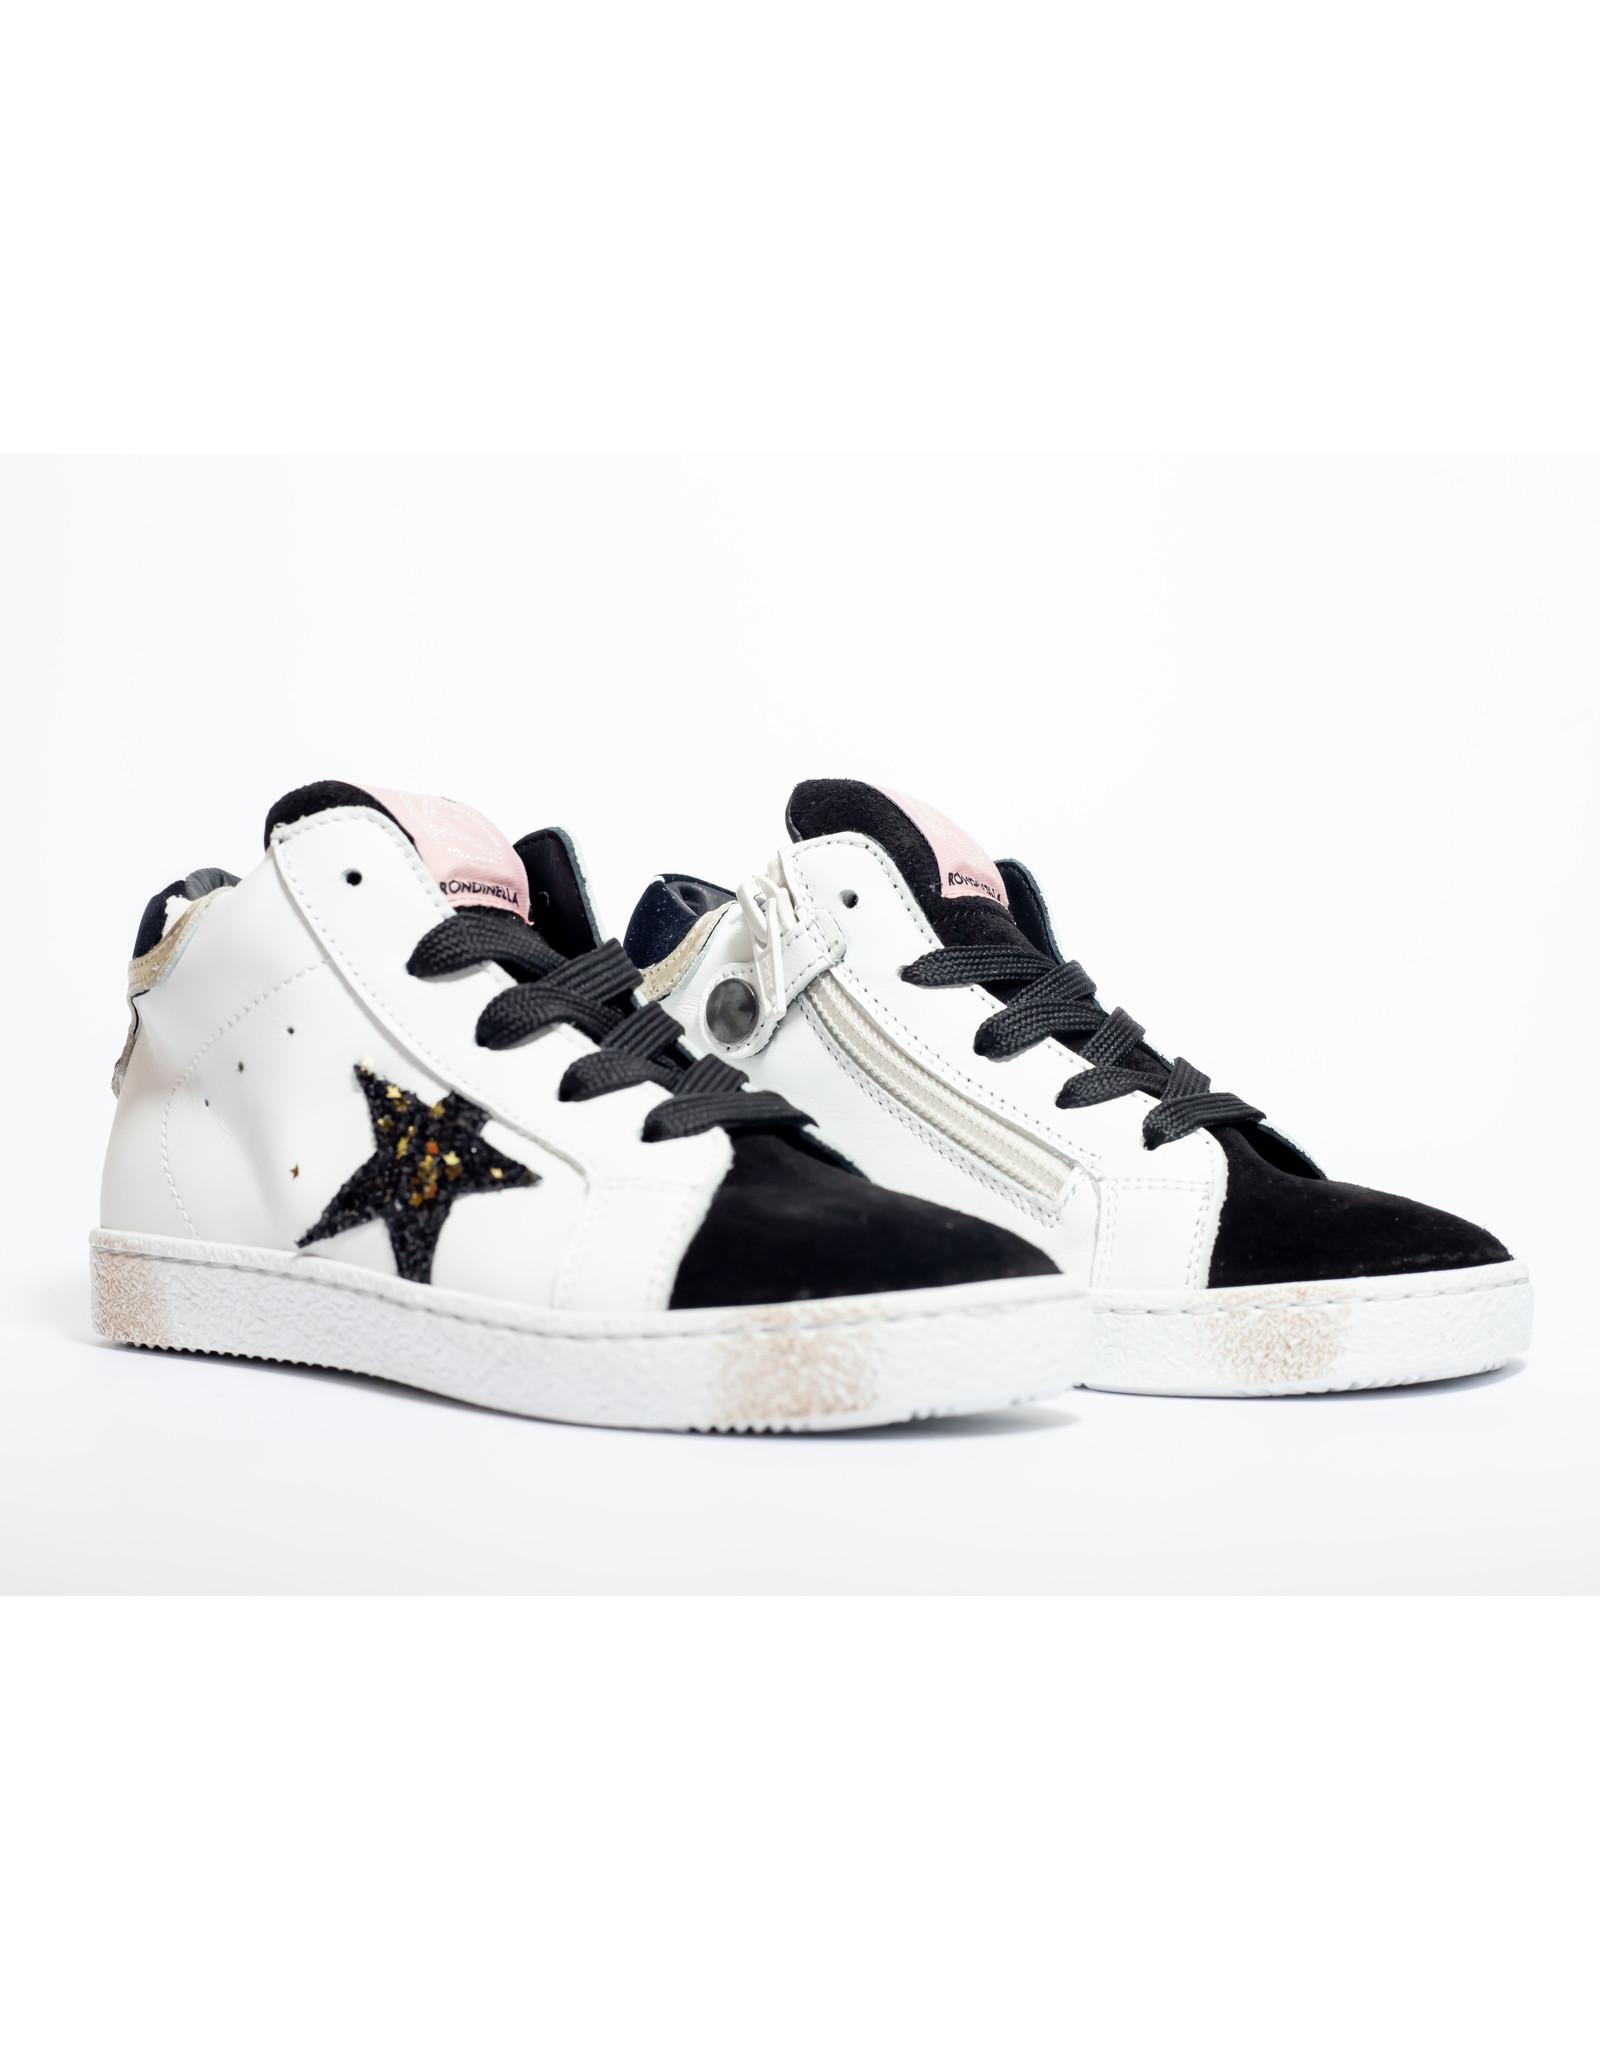 Rondinella hoge sneaker wit zwart  ster